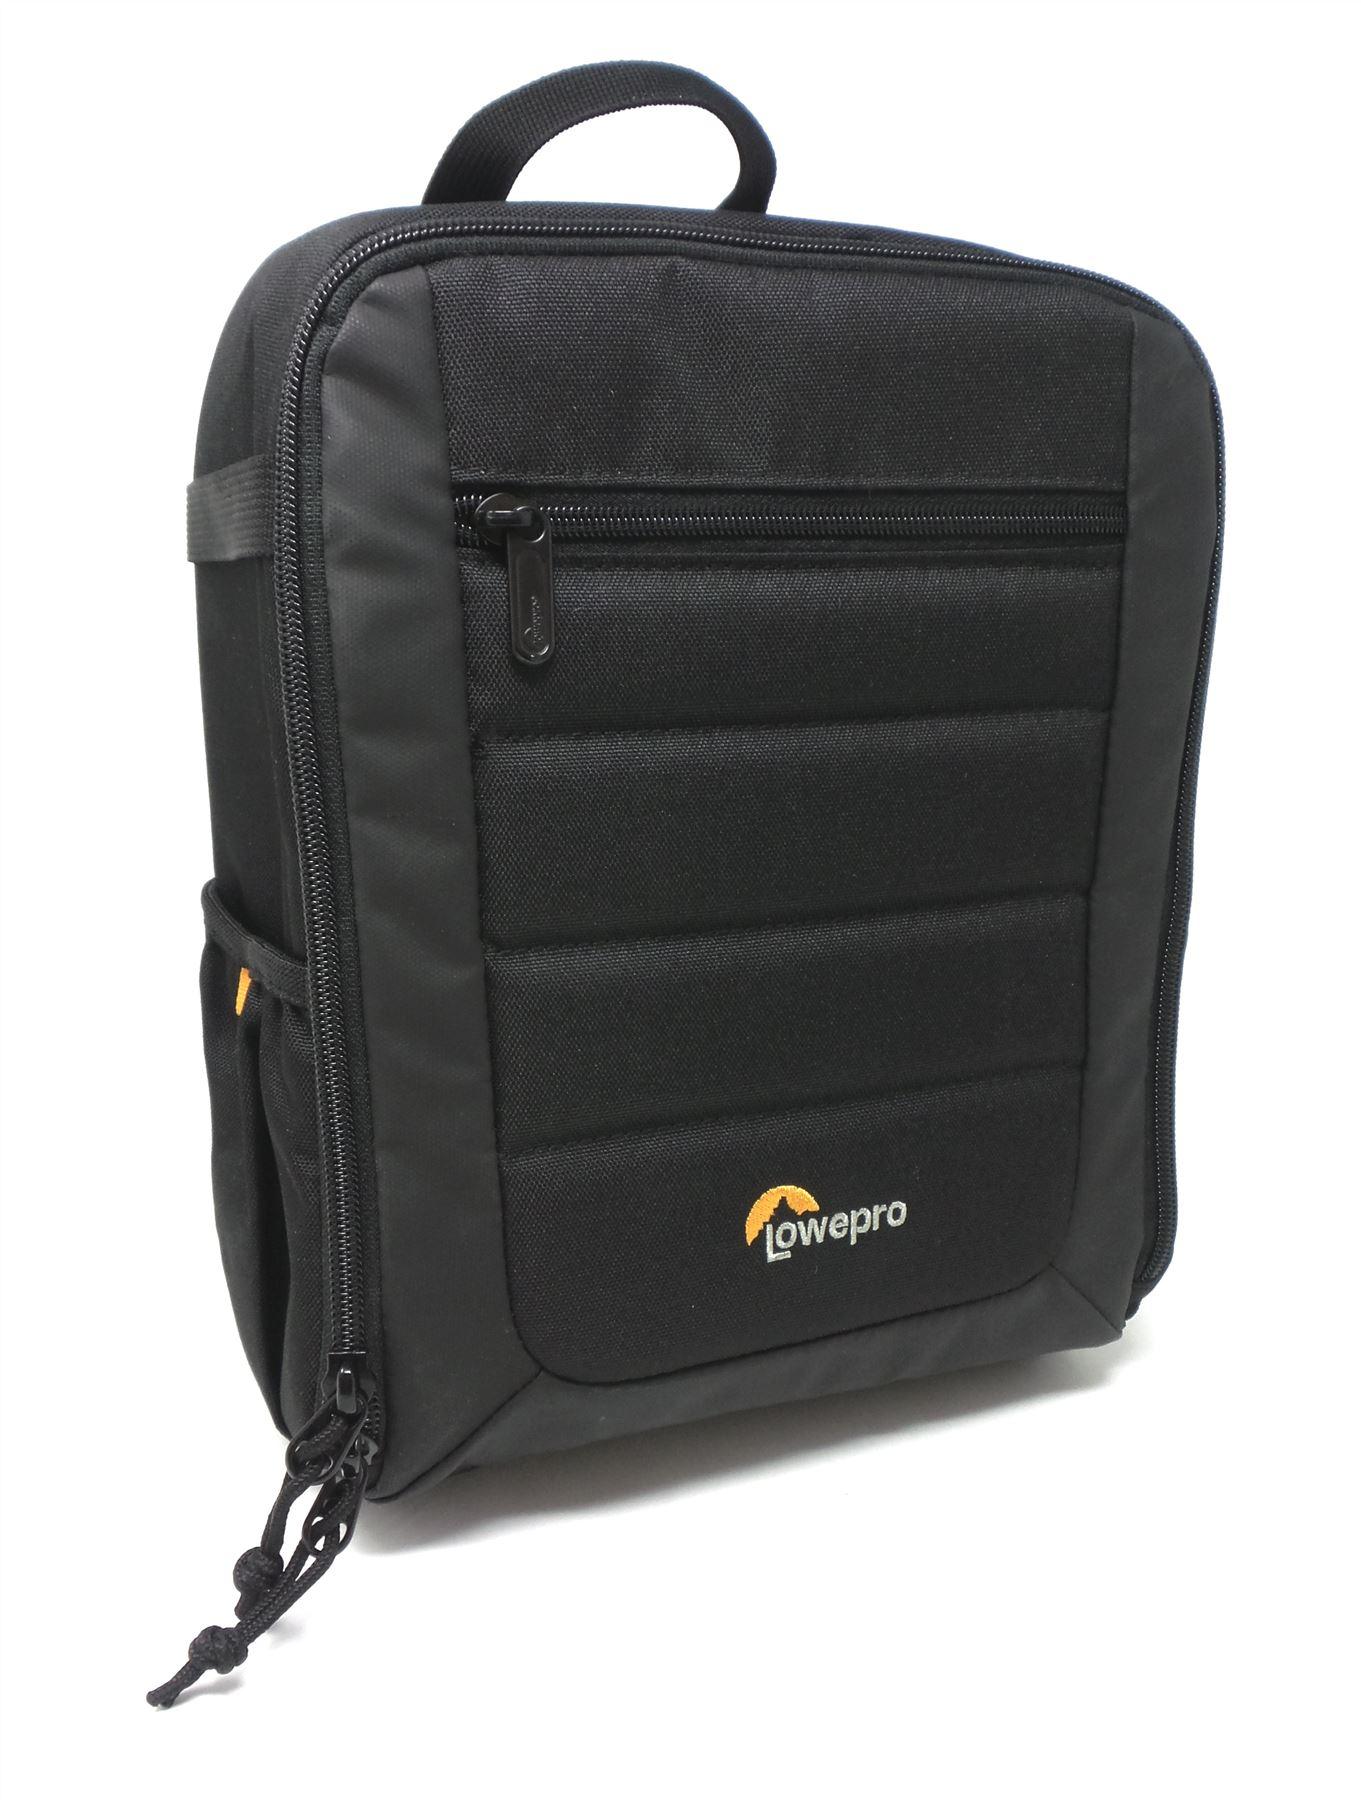 Lowepro Format BP 150 II DSLR Camera Backpack Black New  0490503802fc5